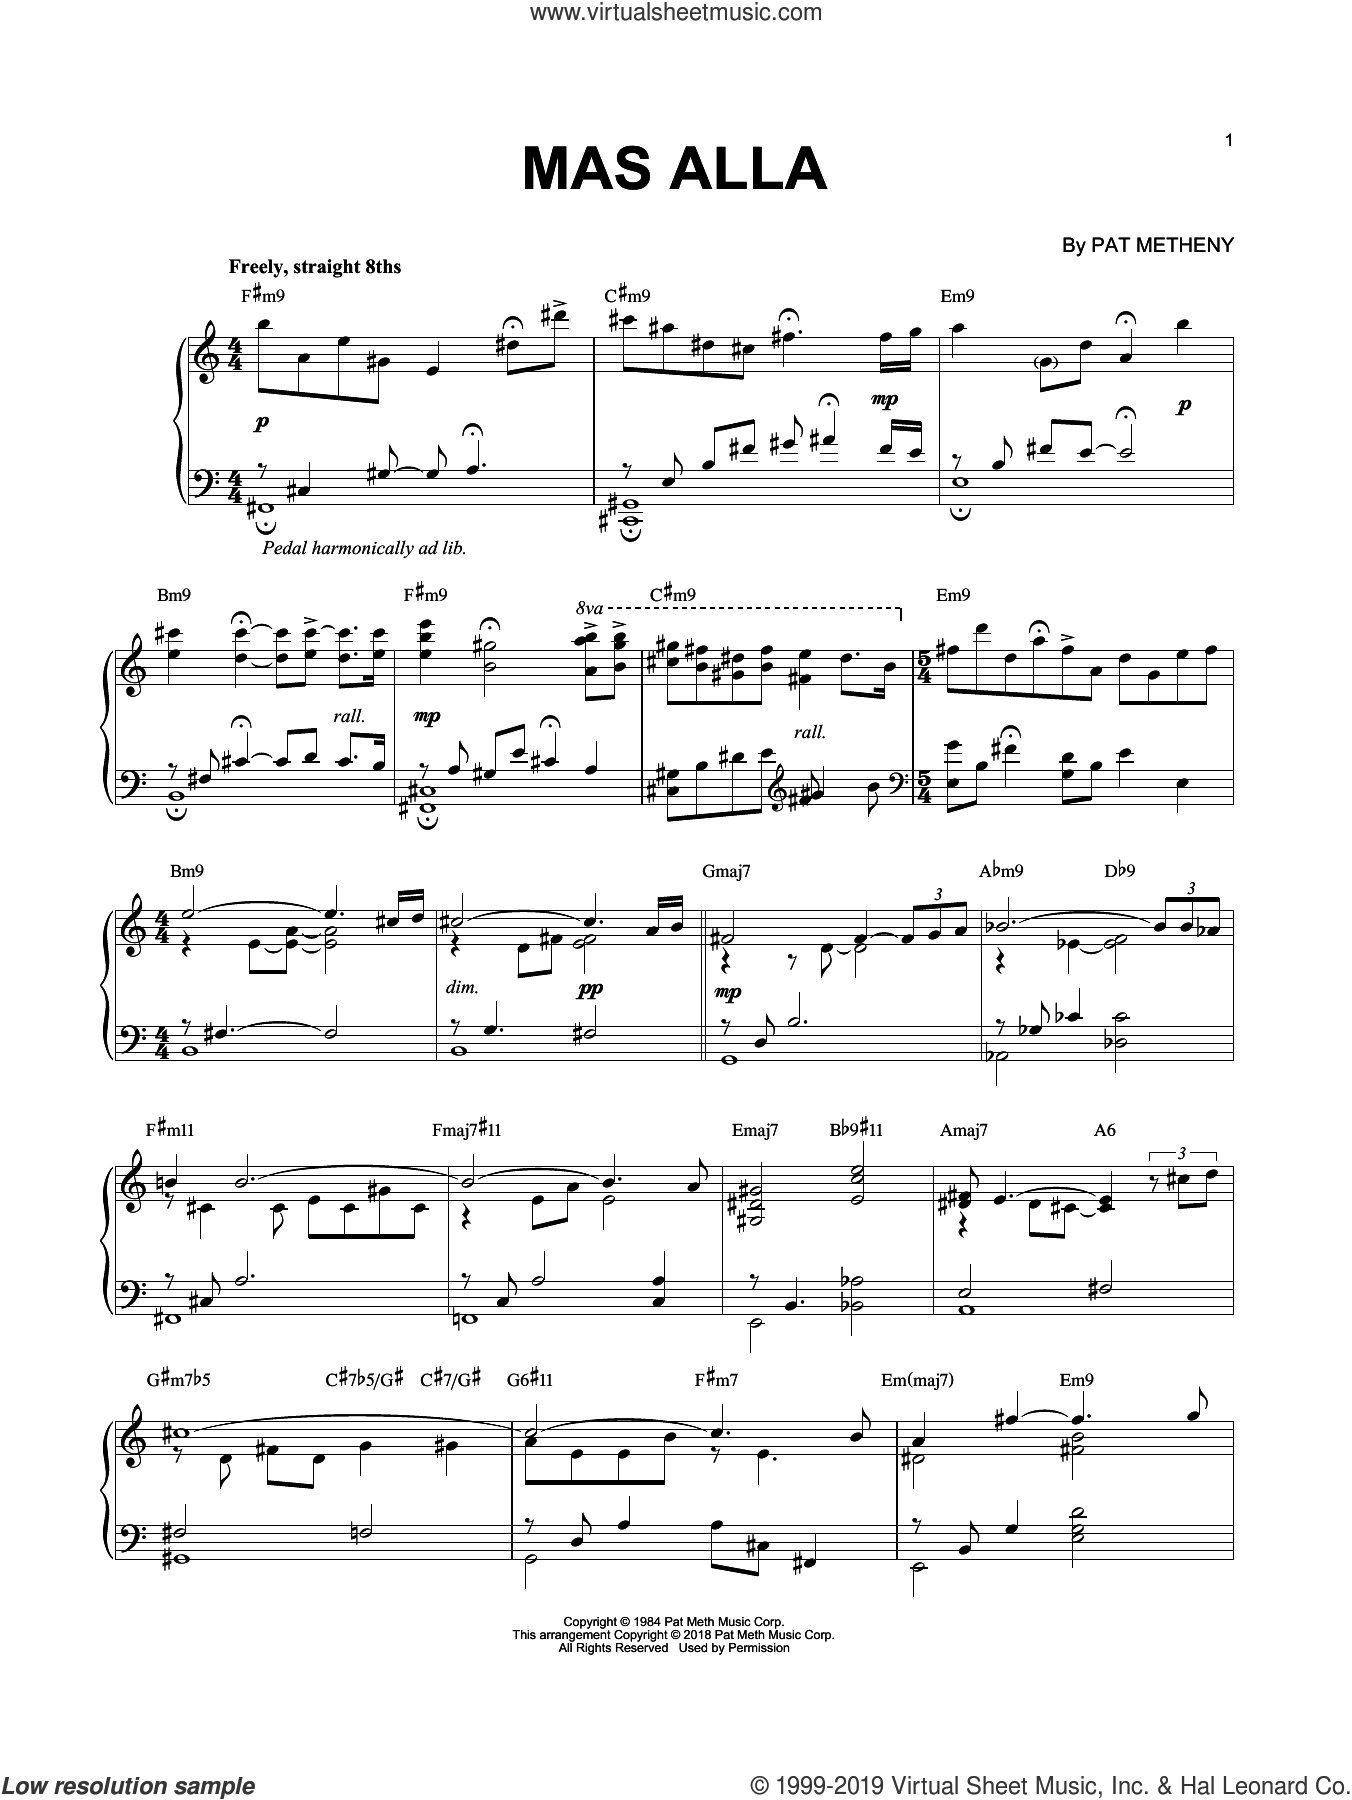 Mas Alla sheet music for piano solo by Pat Metheny and Pedro Aznar, intermediate skill level